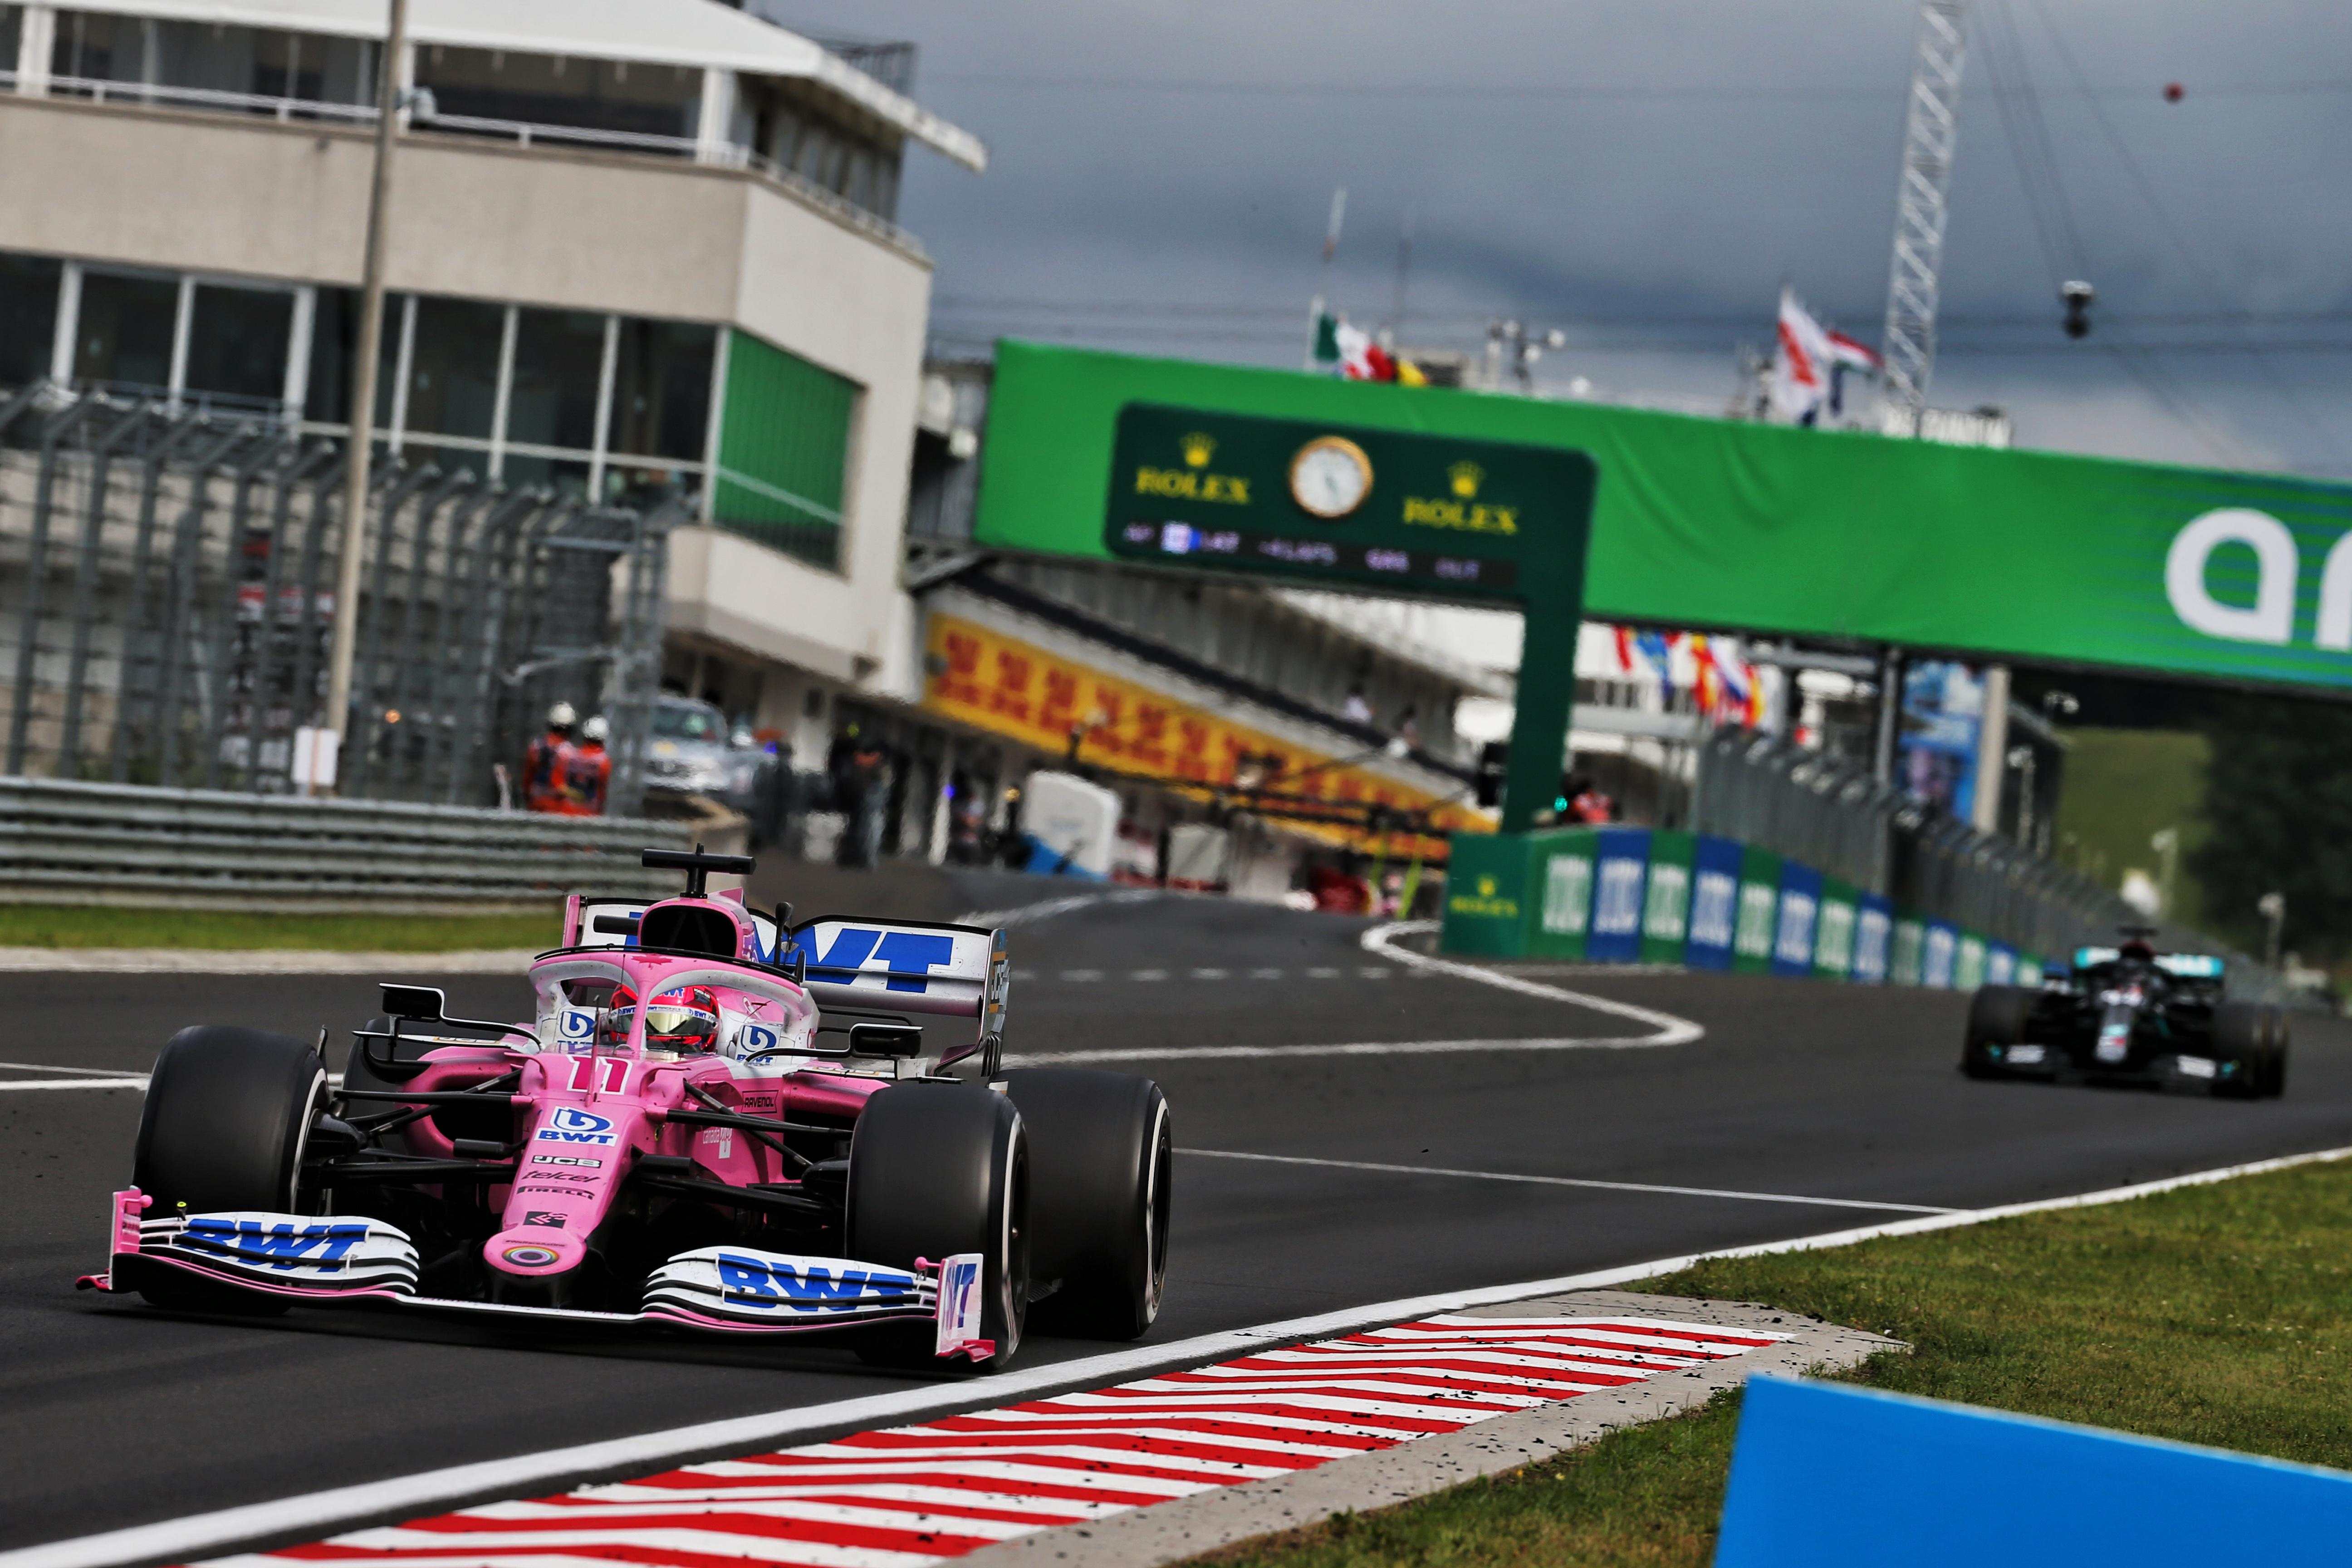 Sergio Perez Racing Point Hungarian Grand Prix 2020